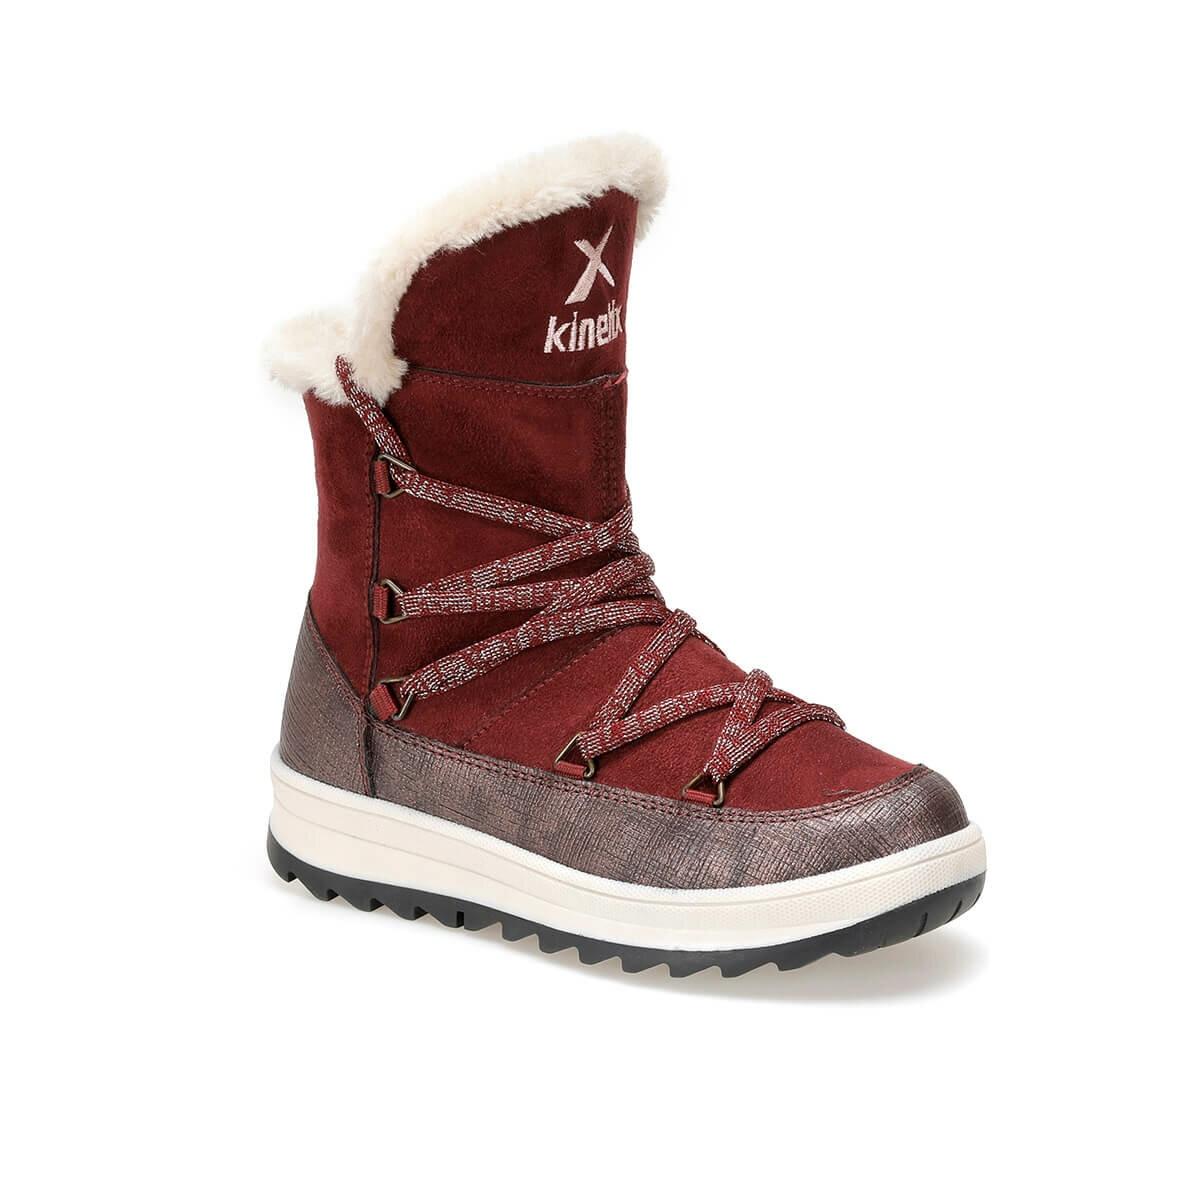 FLO HAVAIS 9PR Burgundy Female Child Boots KINETIX